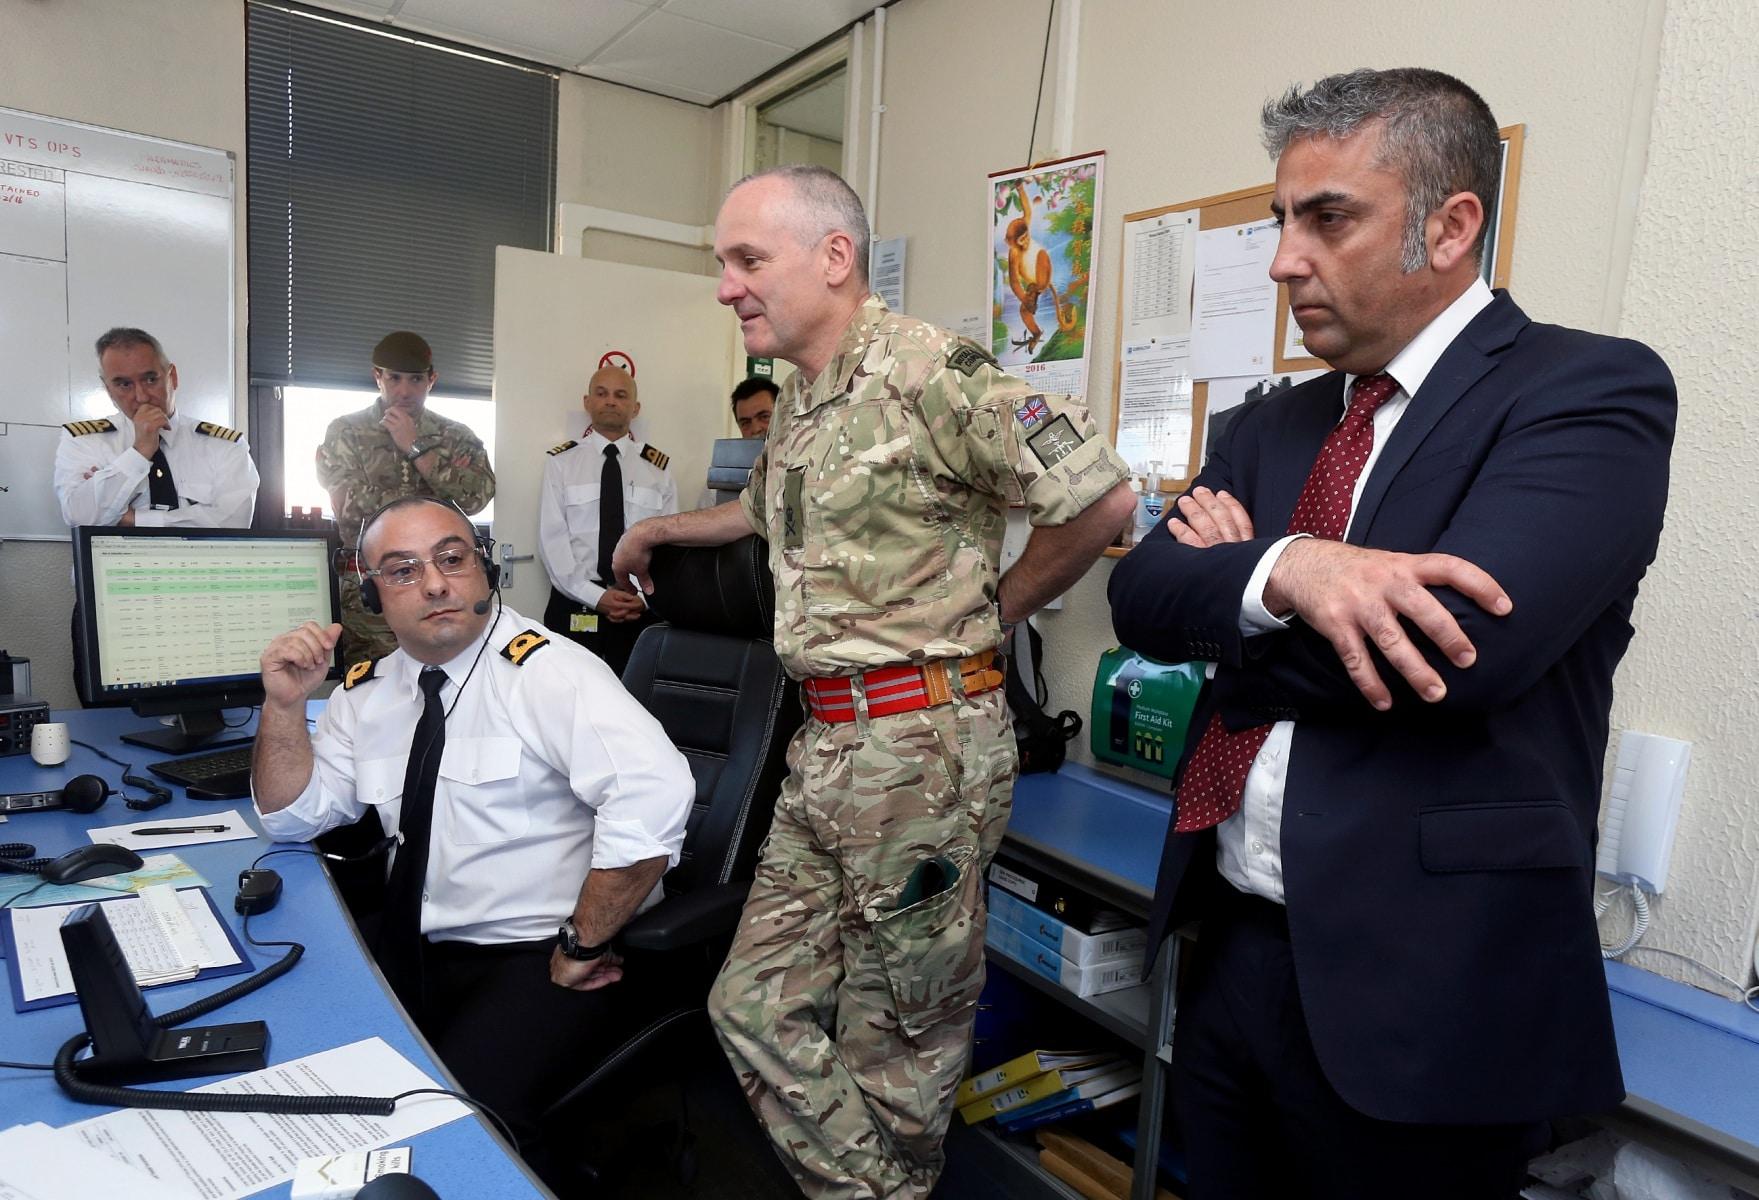 visita-oficial-del-gobernador-al-puerto-de-gibraltar_25549743524_o